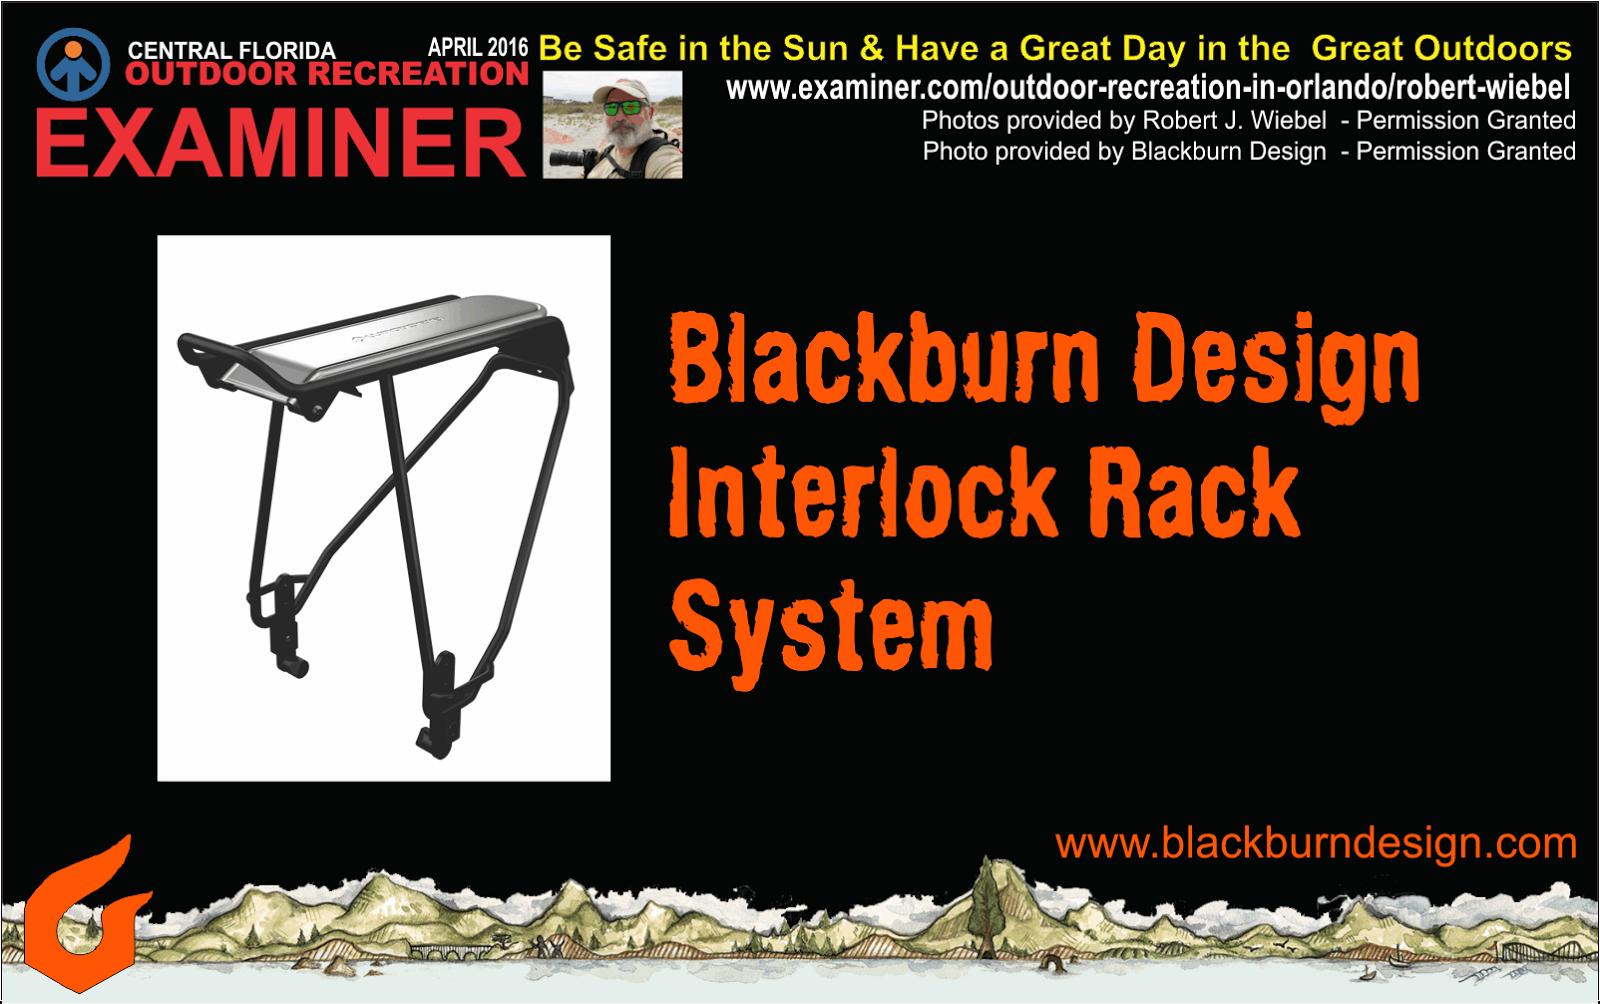 Blackburn Design Interlock Rack System Pannier Bags